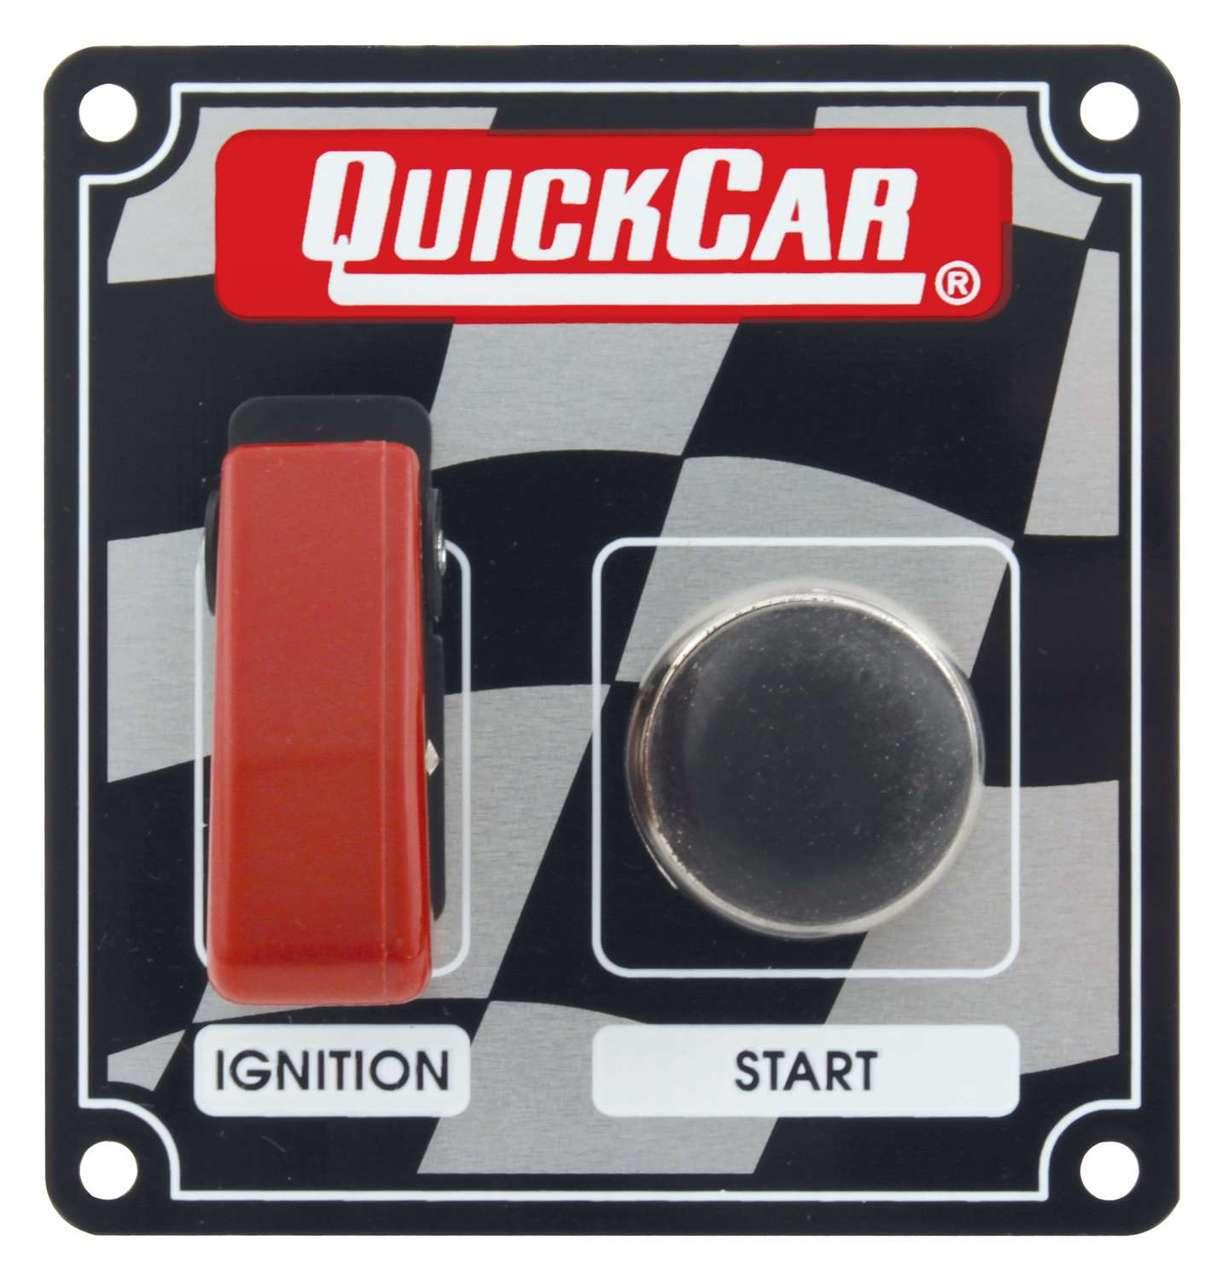 dwarf car mod lite race car parts gsxr 1000 750 600 ... quickcar gauge wiring diagram panel ammeter gauge wiring diagram #13